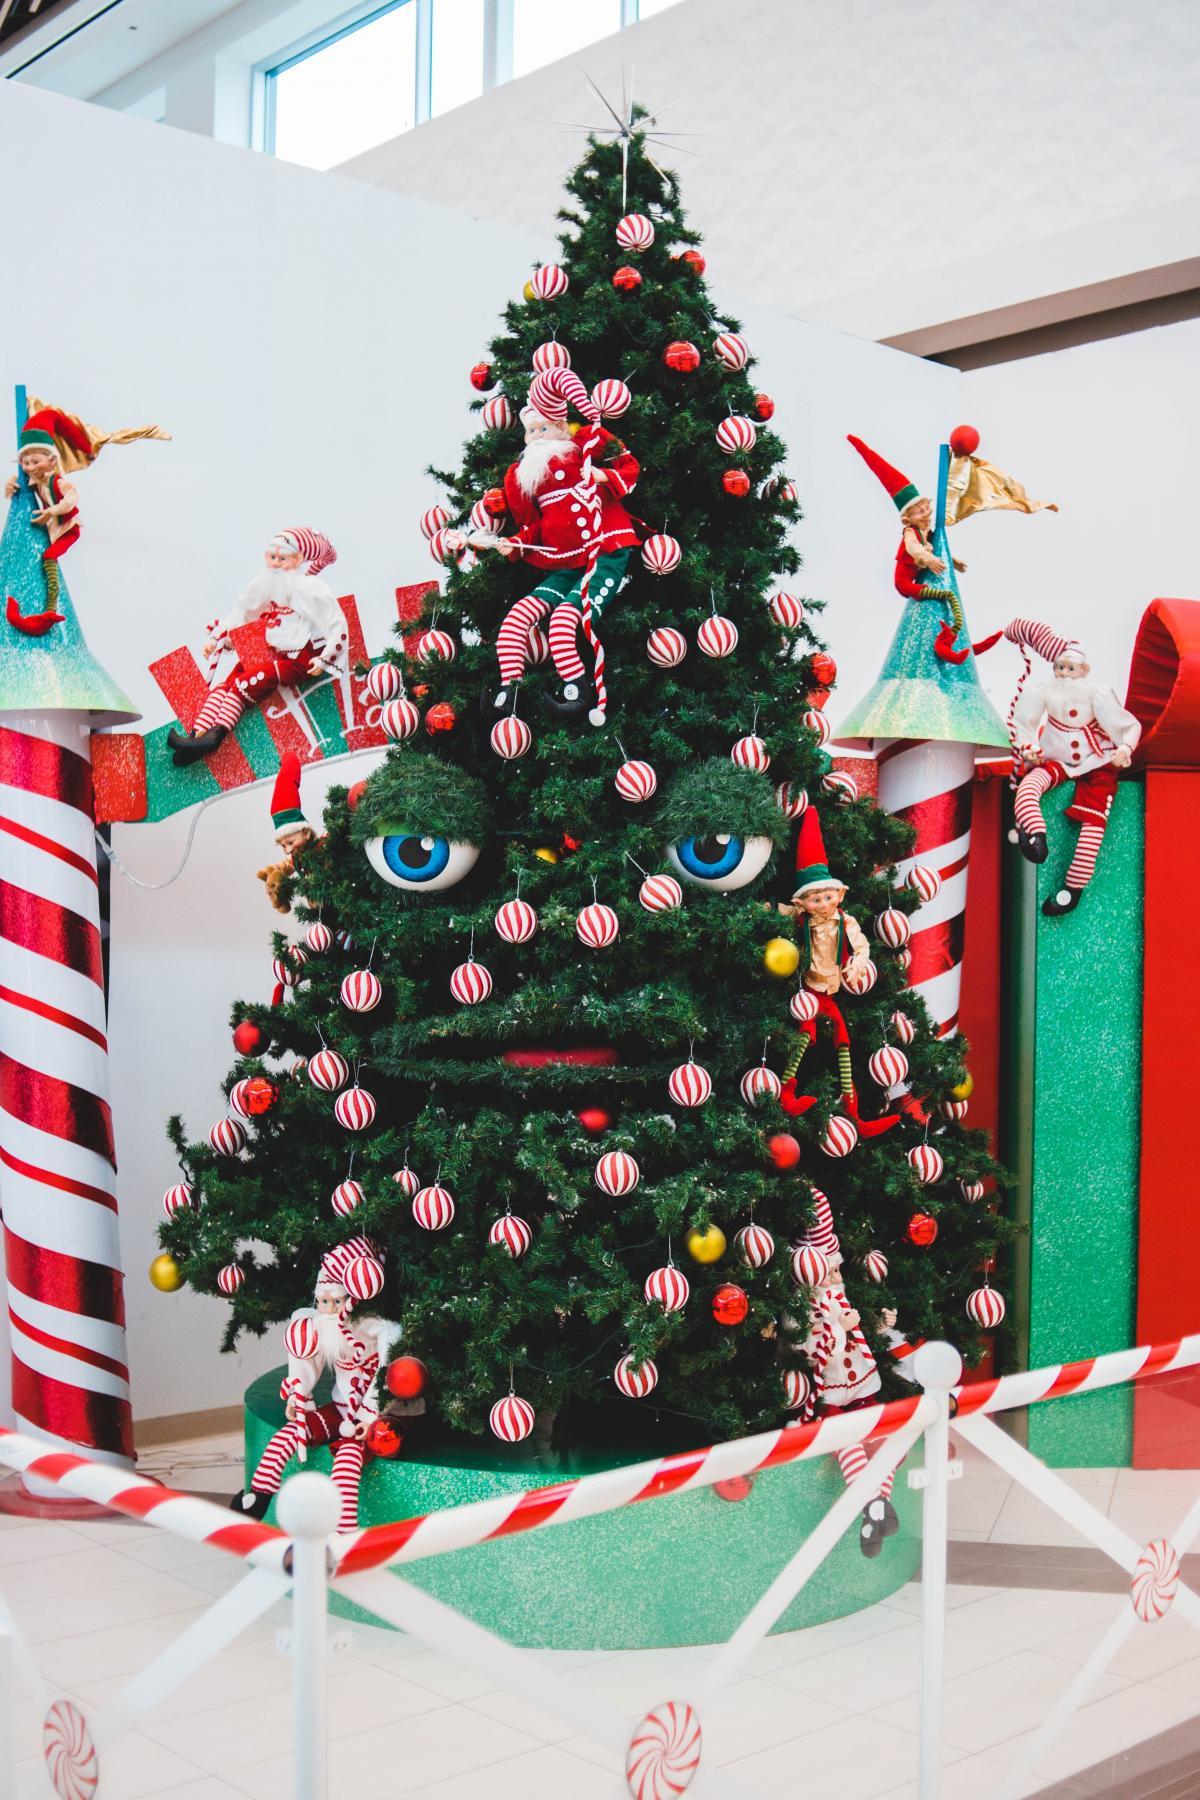 Decoration Holiday Gift #425887